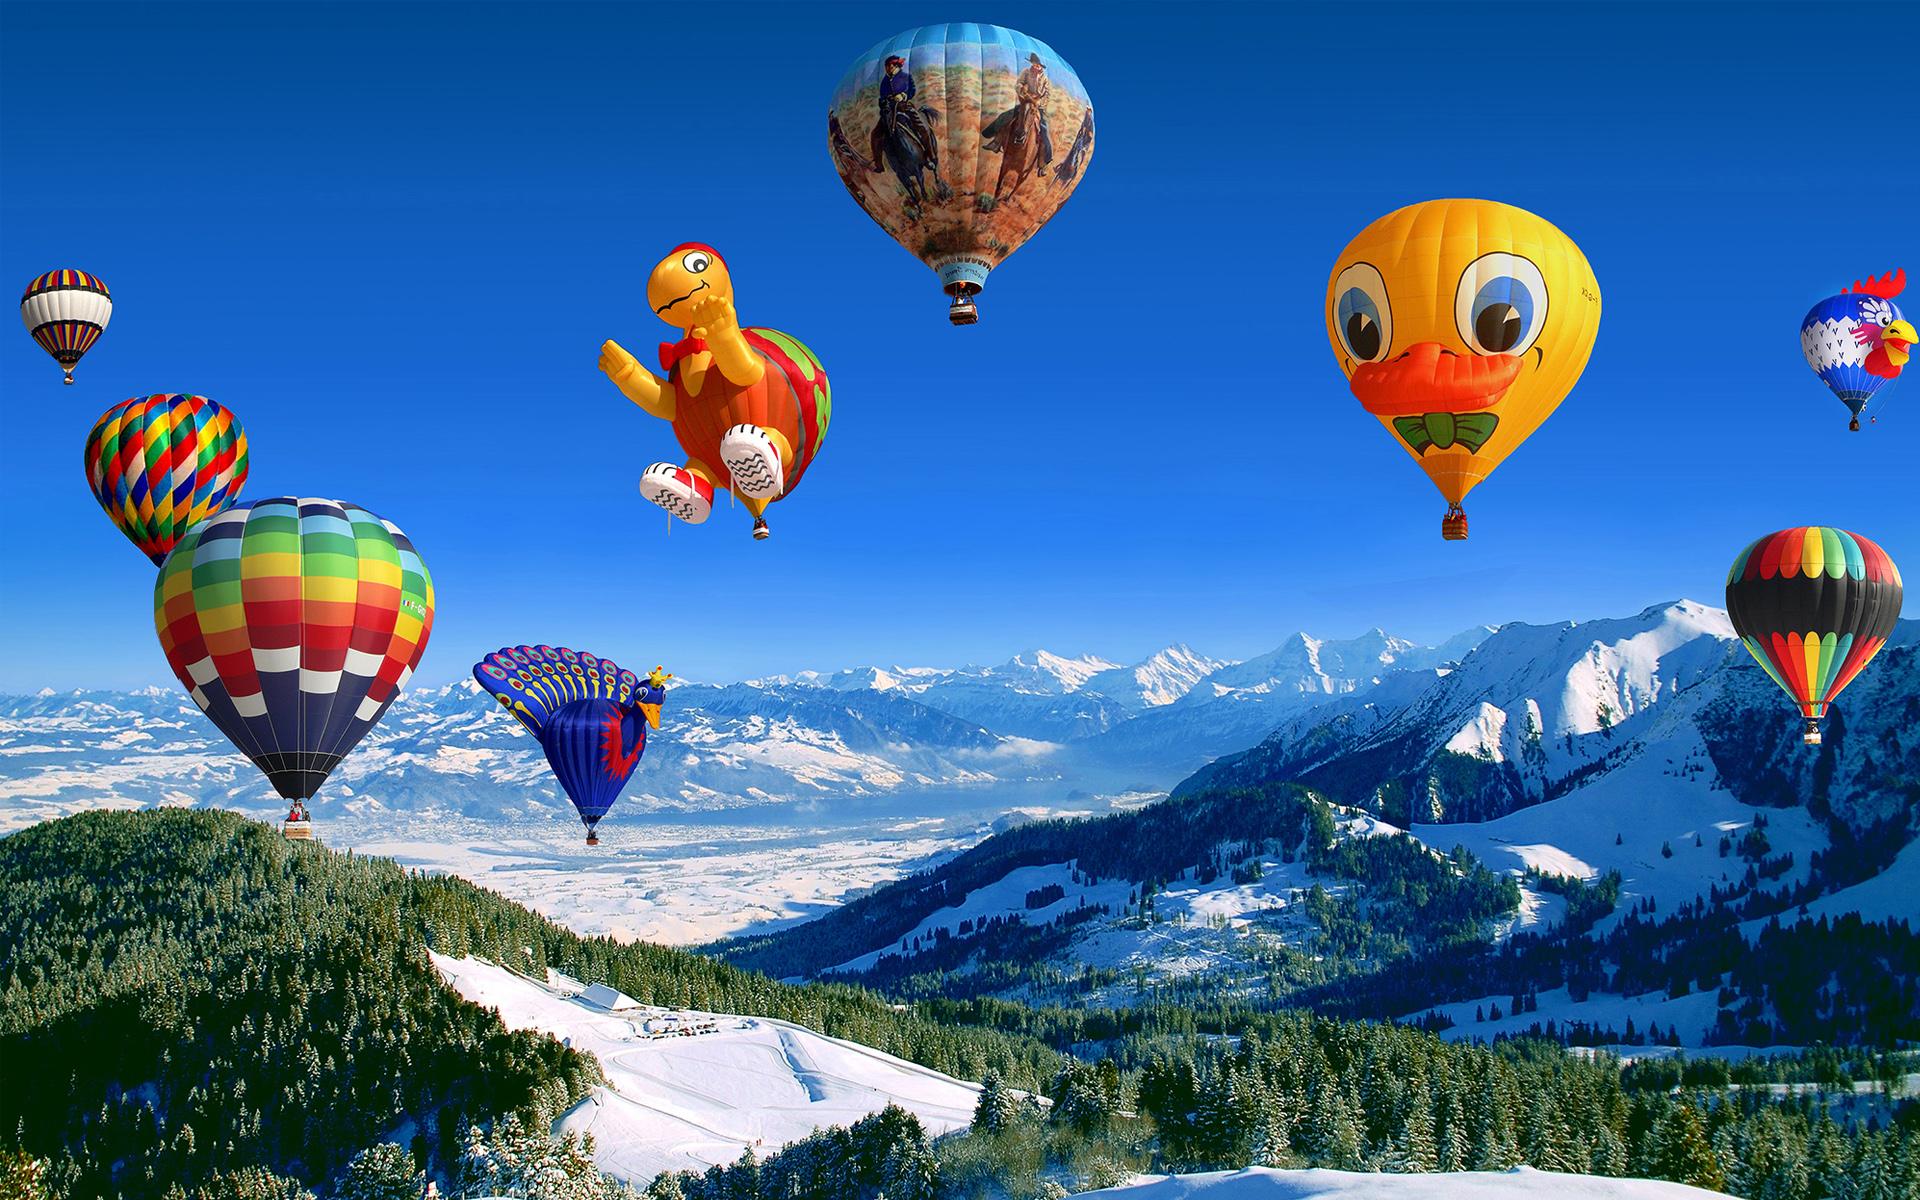 HD Wallpapers Hot Air Balloon Festival